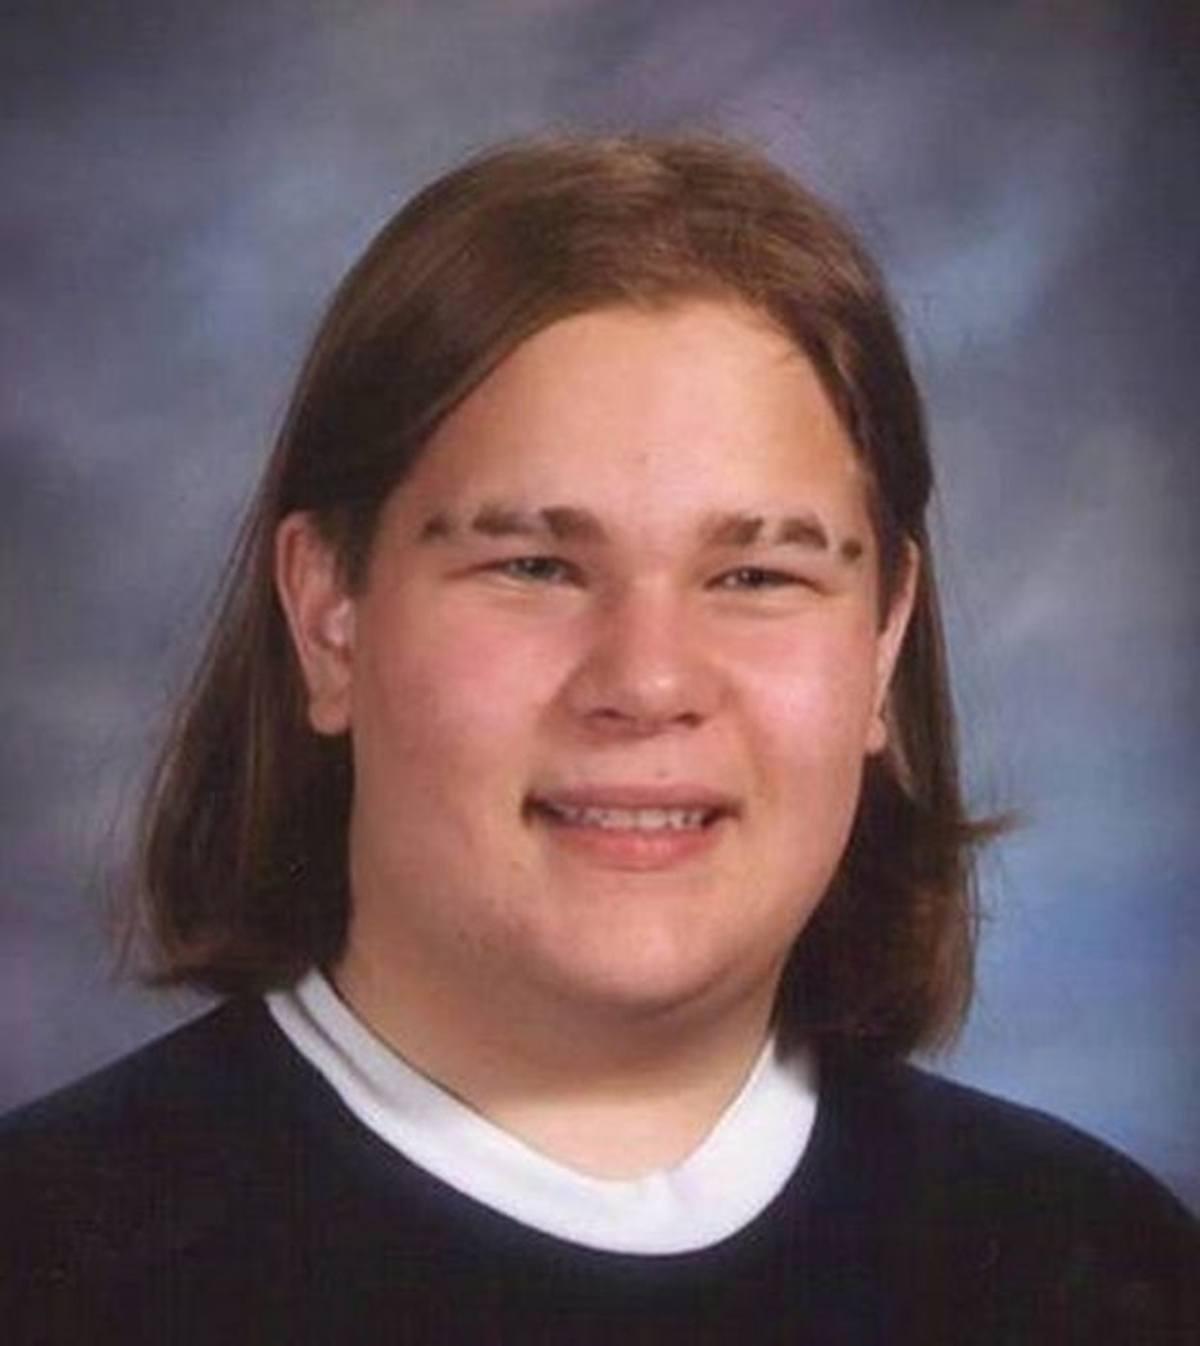 9 1 15 Hilariously Awkward Yearbook Photos